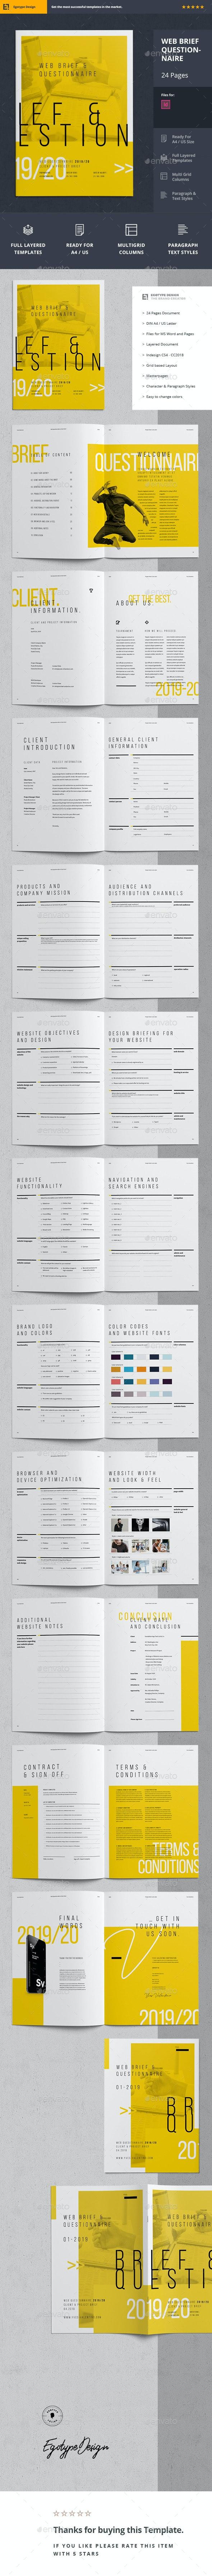 Web Brief Questionnaire - Informational Brochures